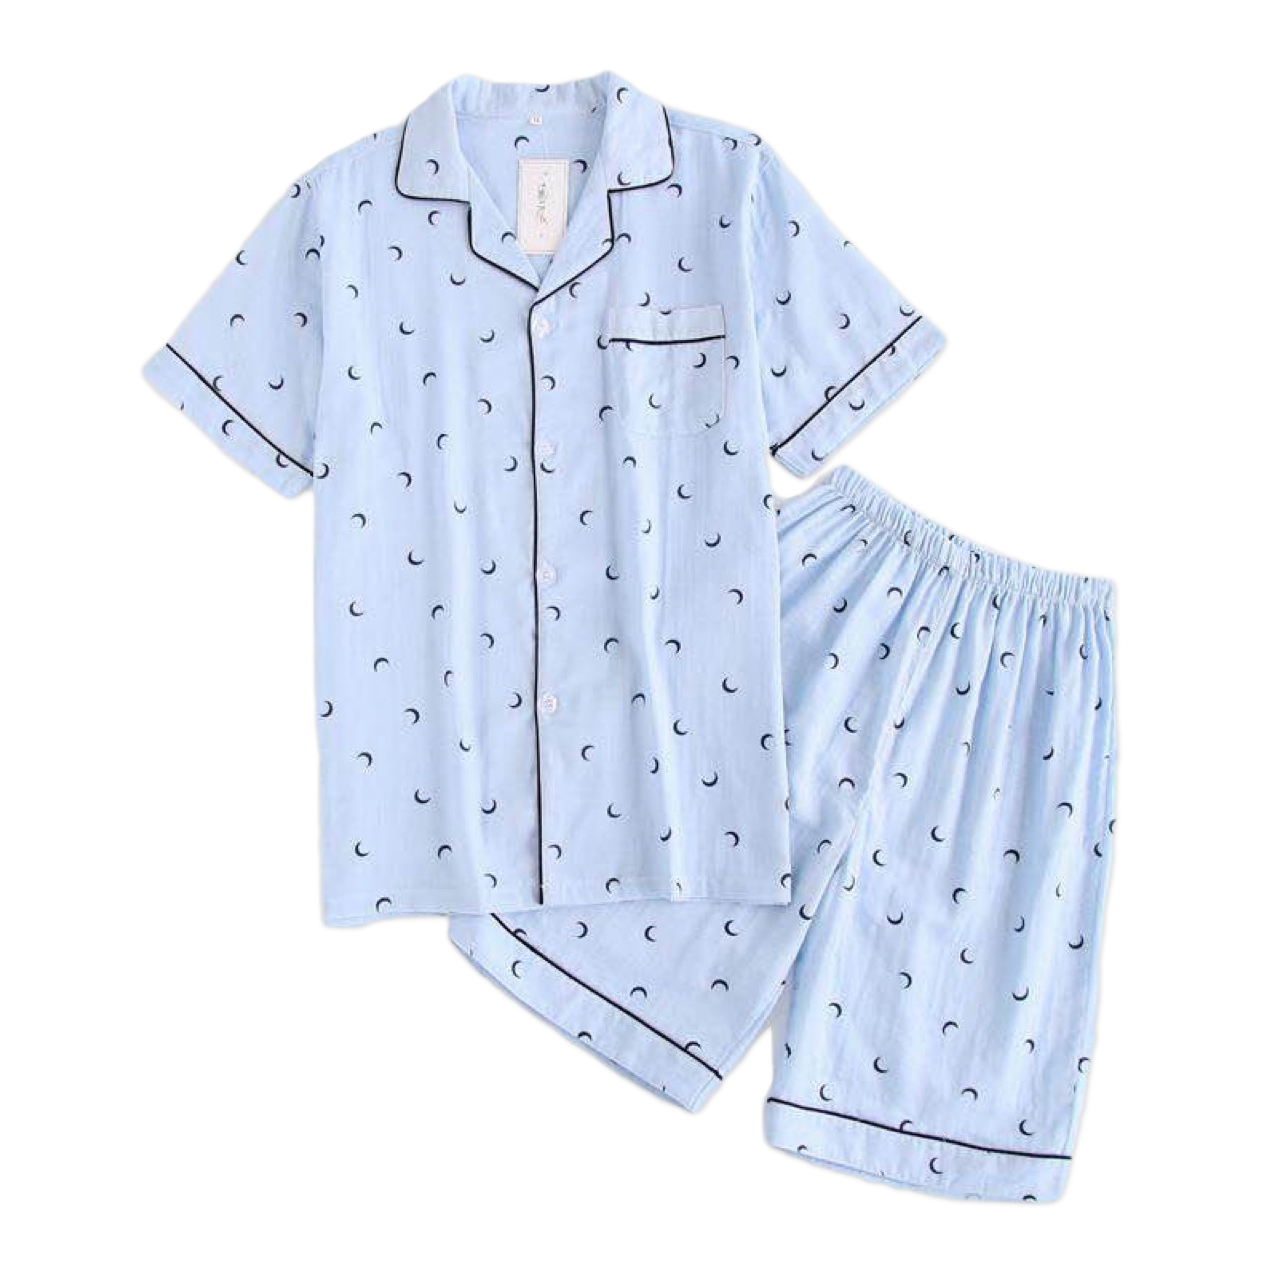 Couples simple moon blue pajamas sets men short pijama hombre Summer 100% gauze cotton short sleeves pyjamas korean pyjama homme Пижама